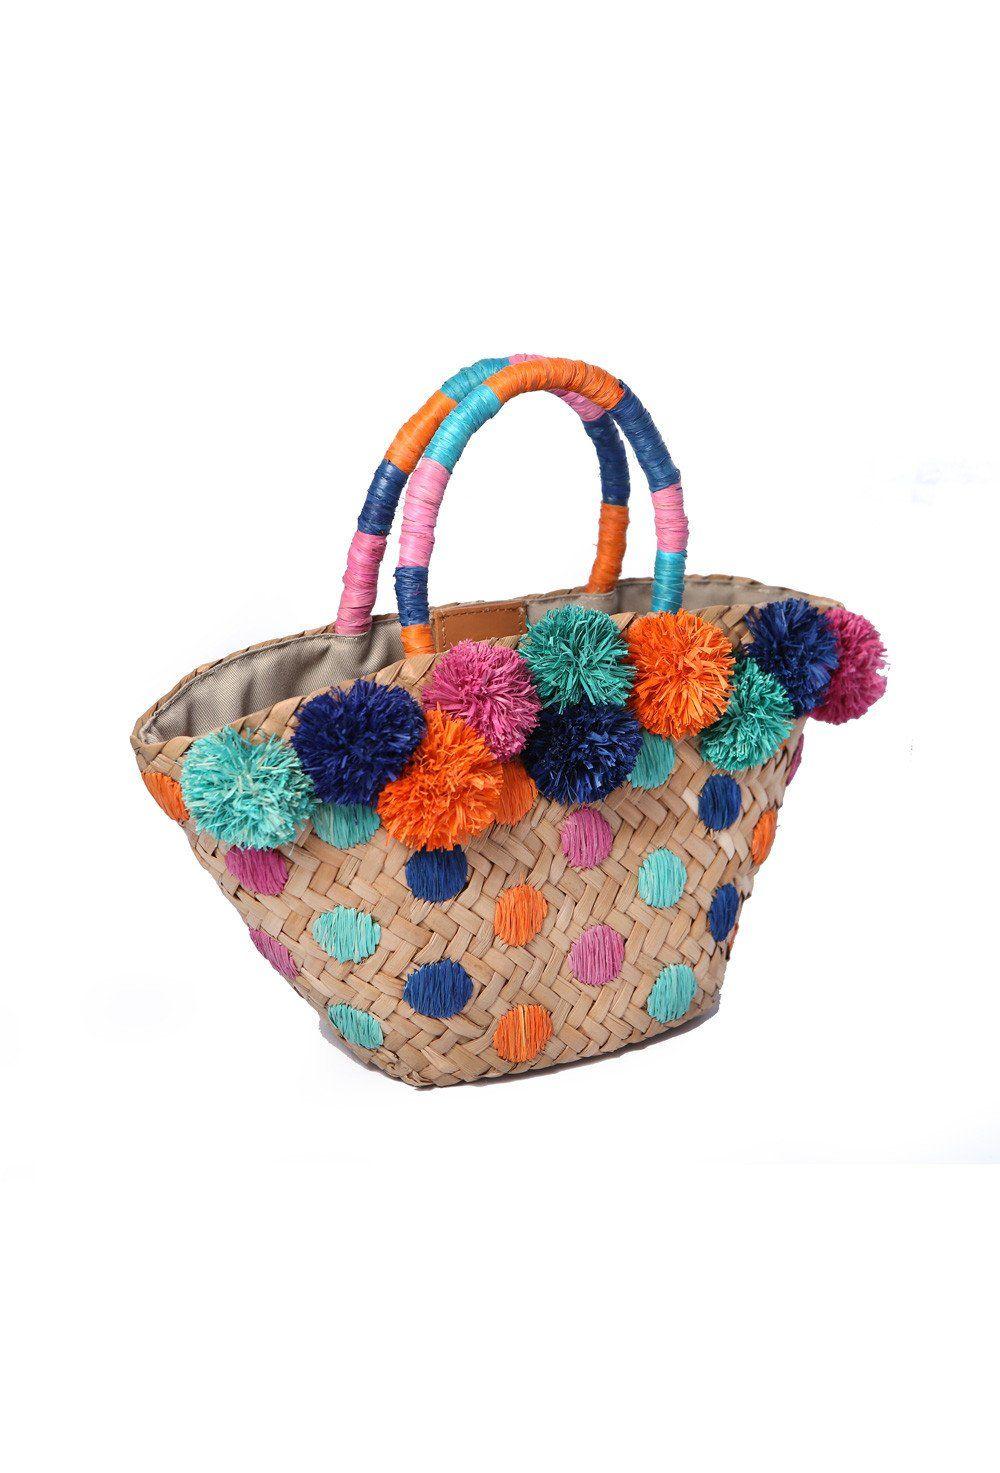 Mini Chiquita Basket With Pompoms Aranaz Bags Beach Flamingo